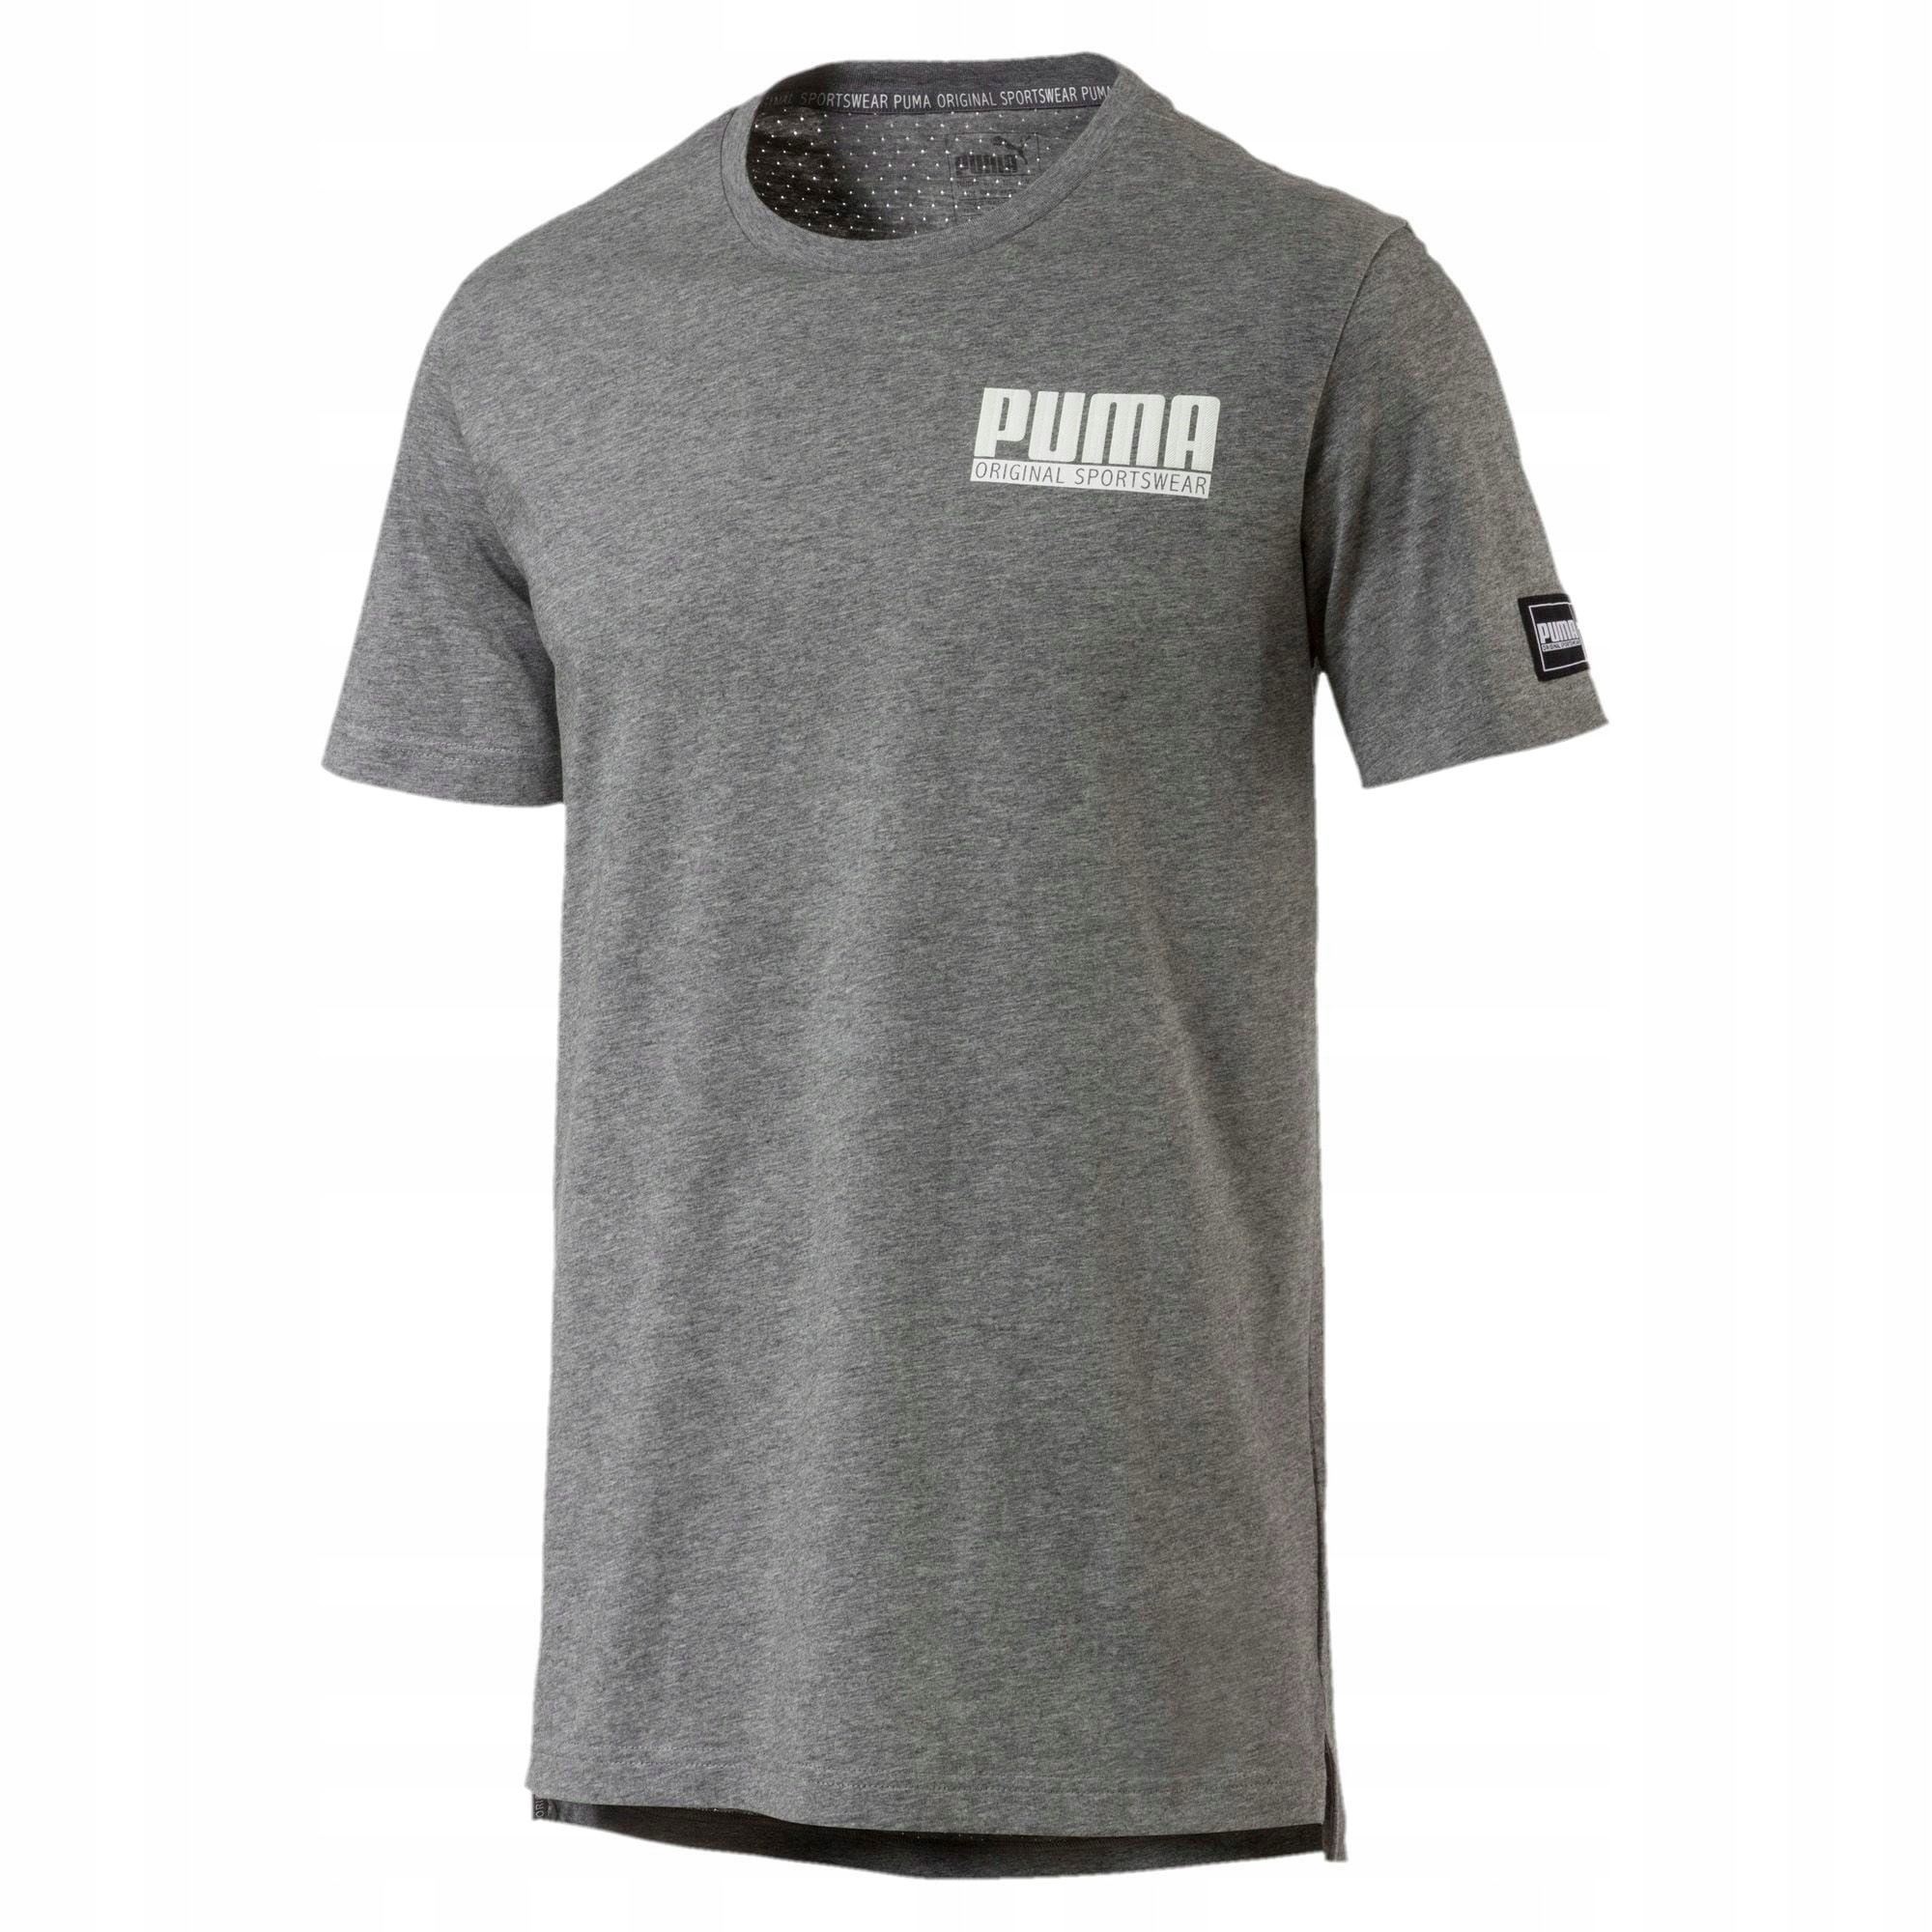 Koszulka męska Style Athletic Tee Puma (biała)